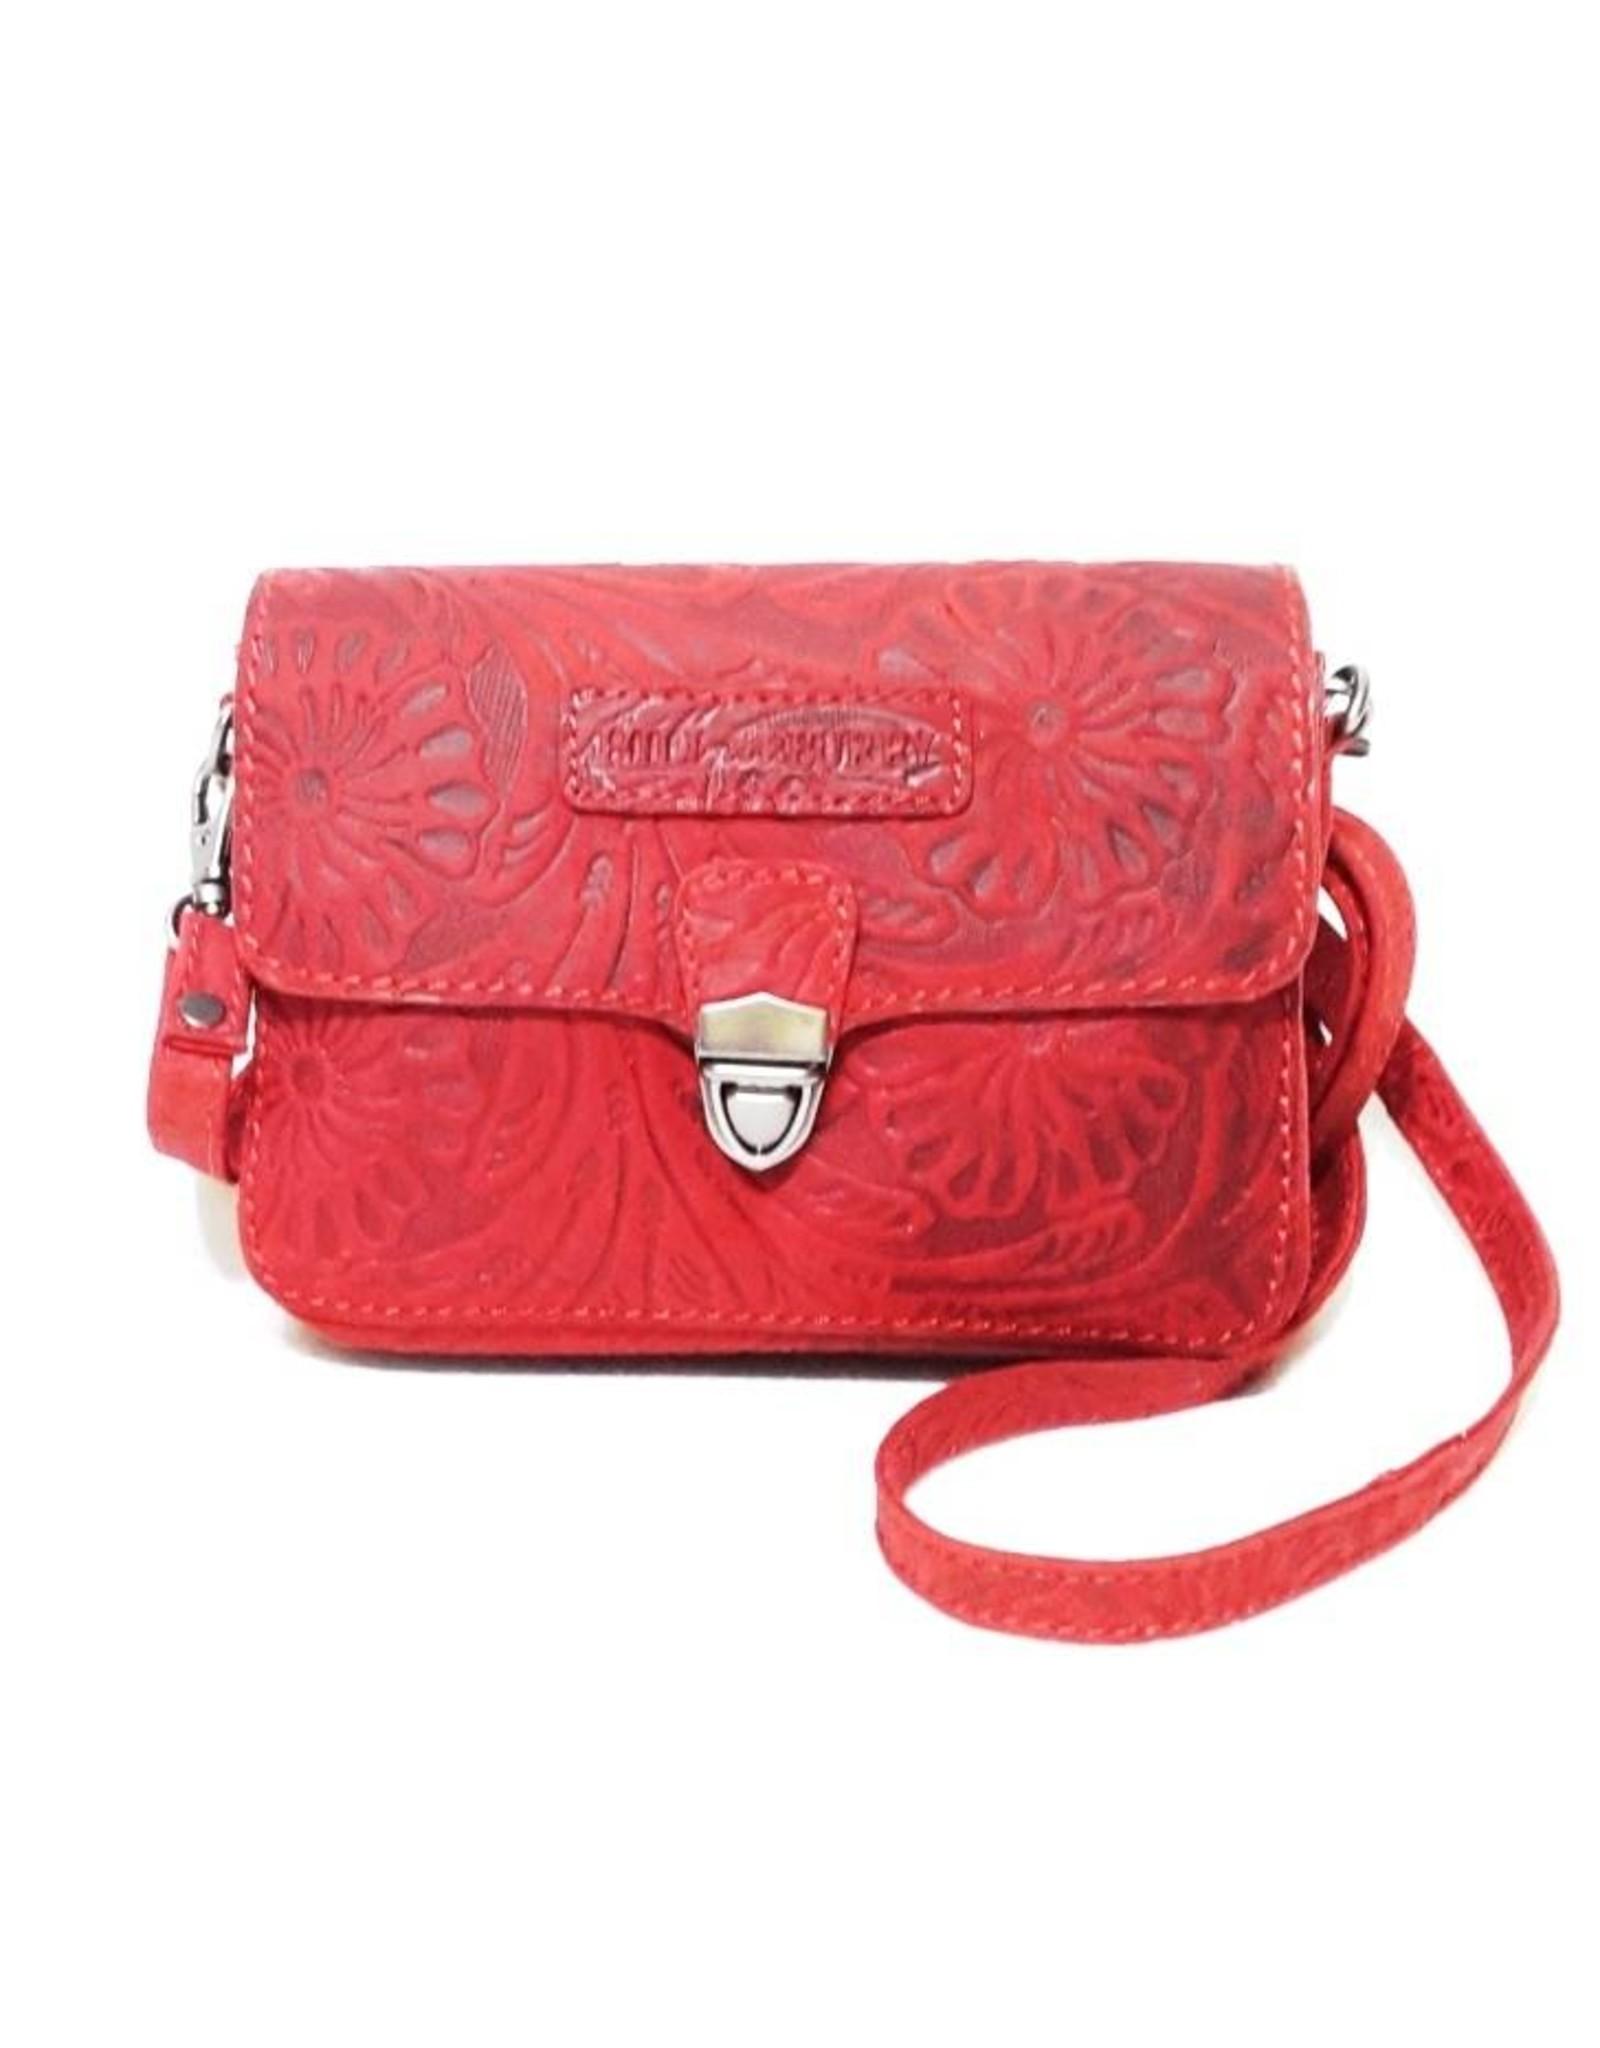 HillBurry Leather bags - Hillburry leather shoulder bag 3279f-rd